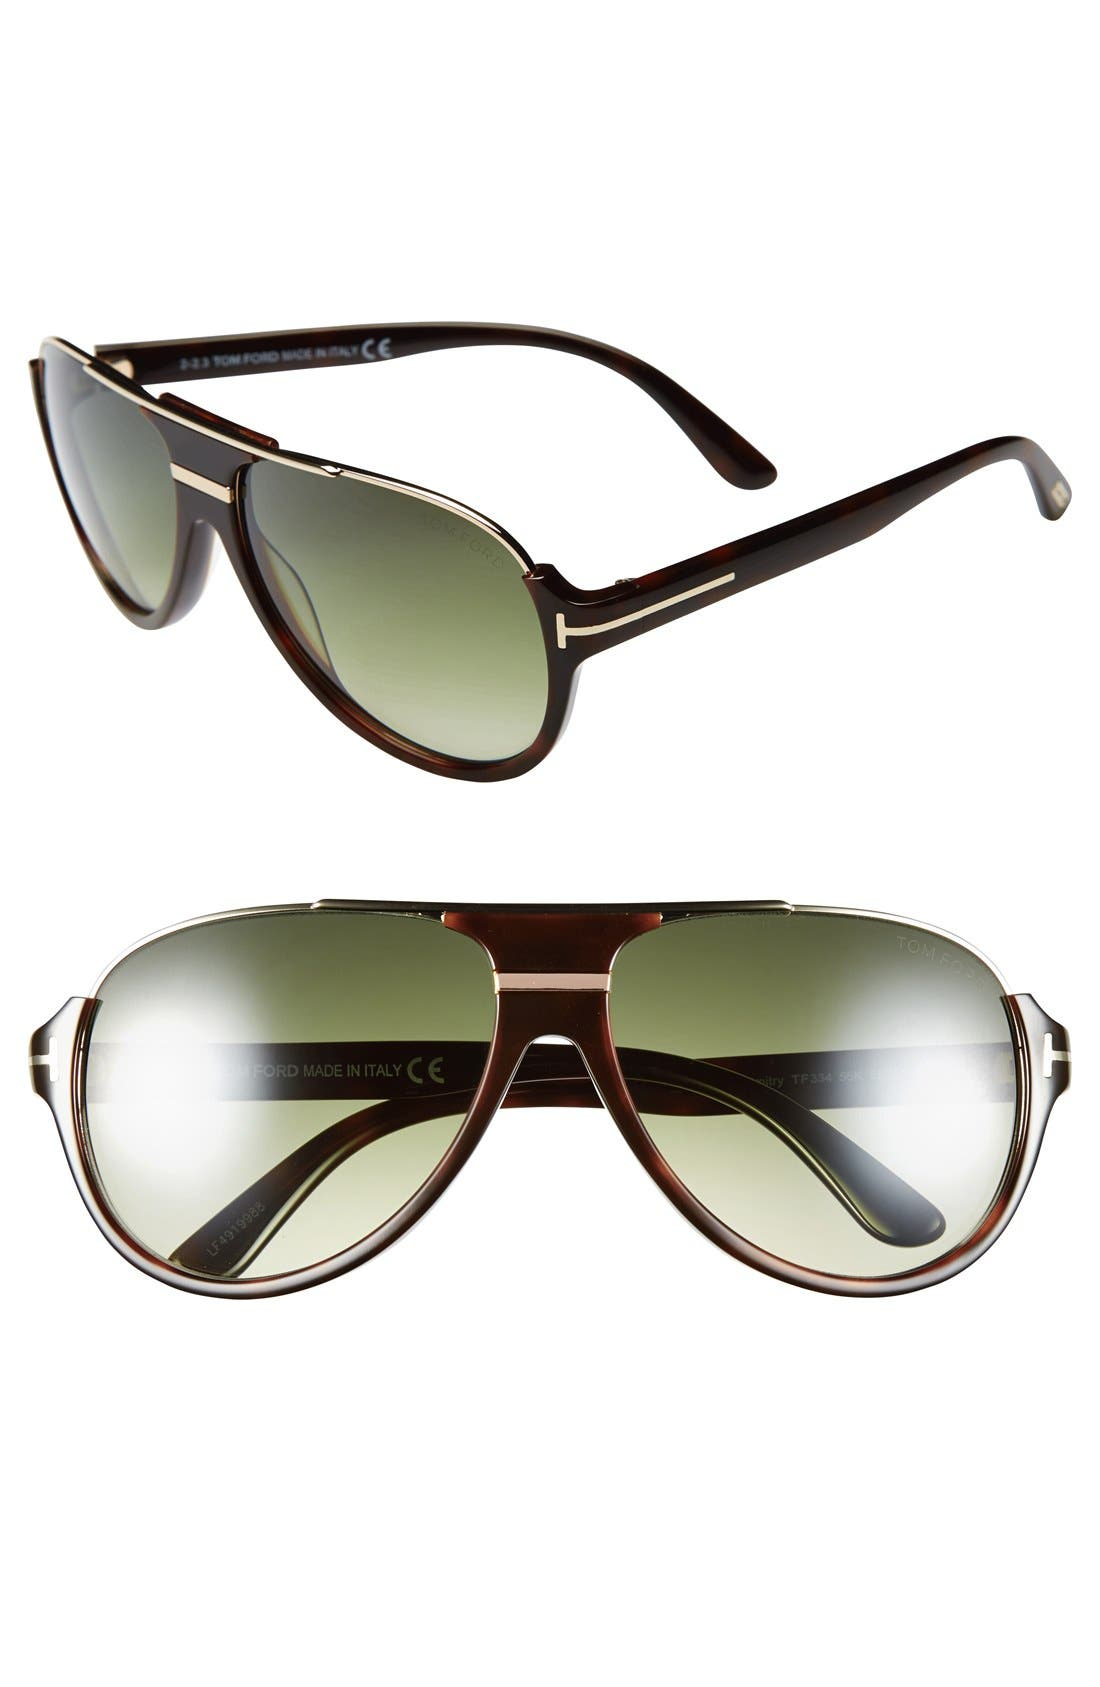 Main Image - Tom Ford 'Dimitry' 59mm Aviator Sunglasses